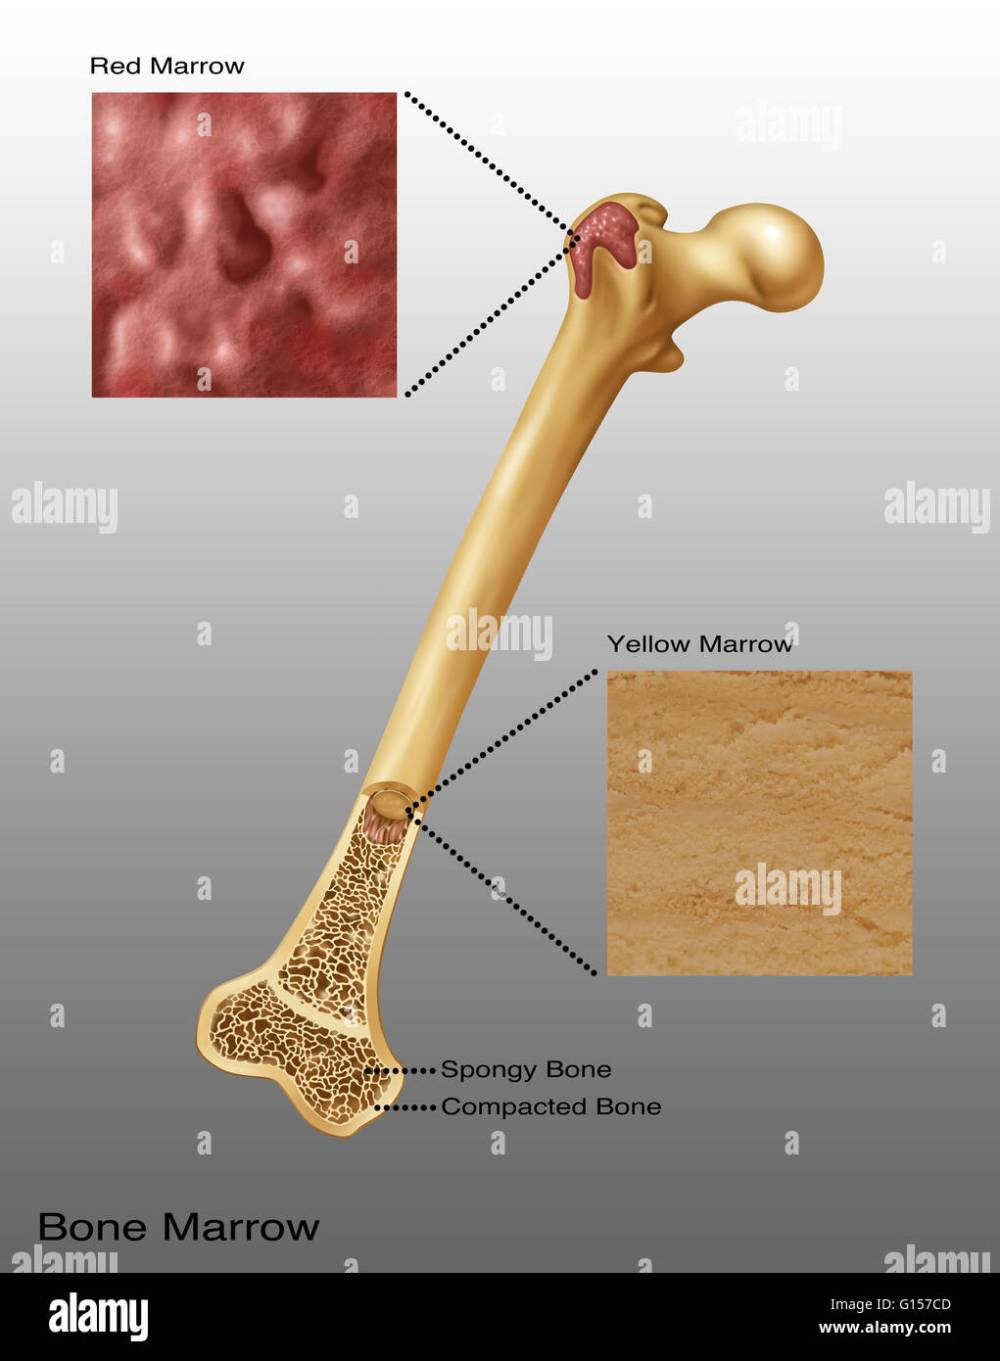 medium resolution of illustration of bone marrow top diagram shows red bone marrow bottom diagram shows yellow marrow spongy bone and compacted bone also visible